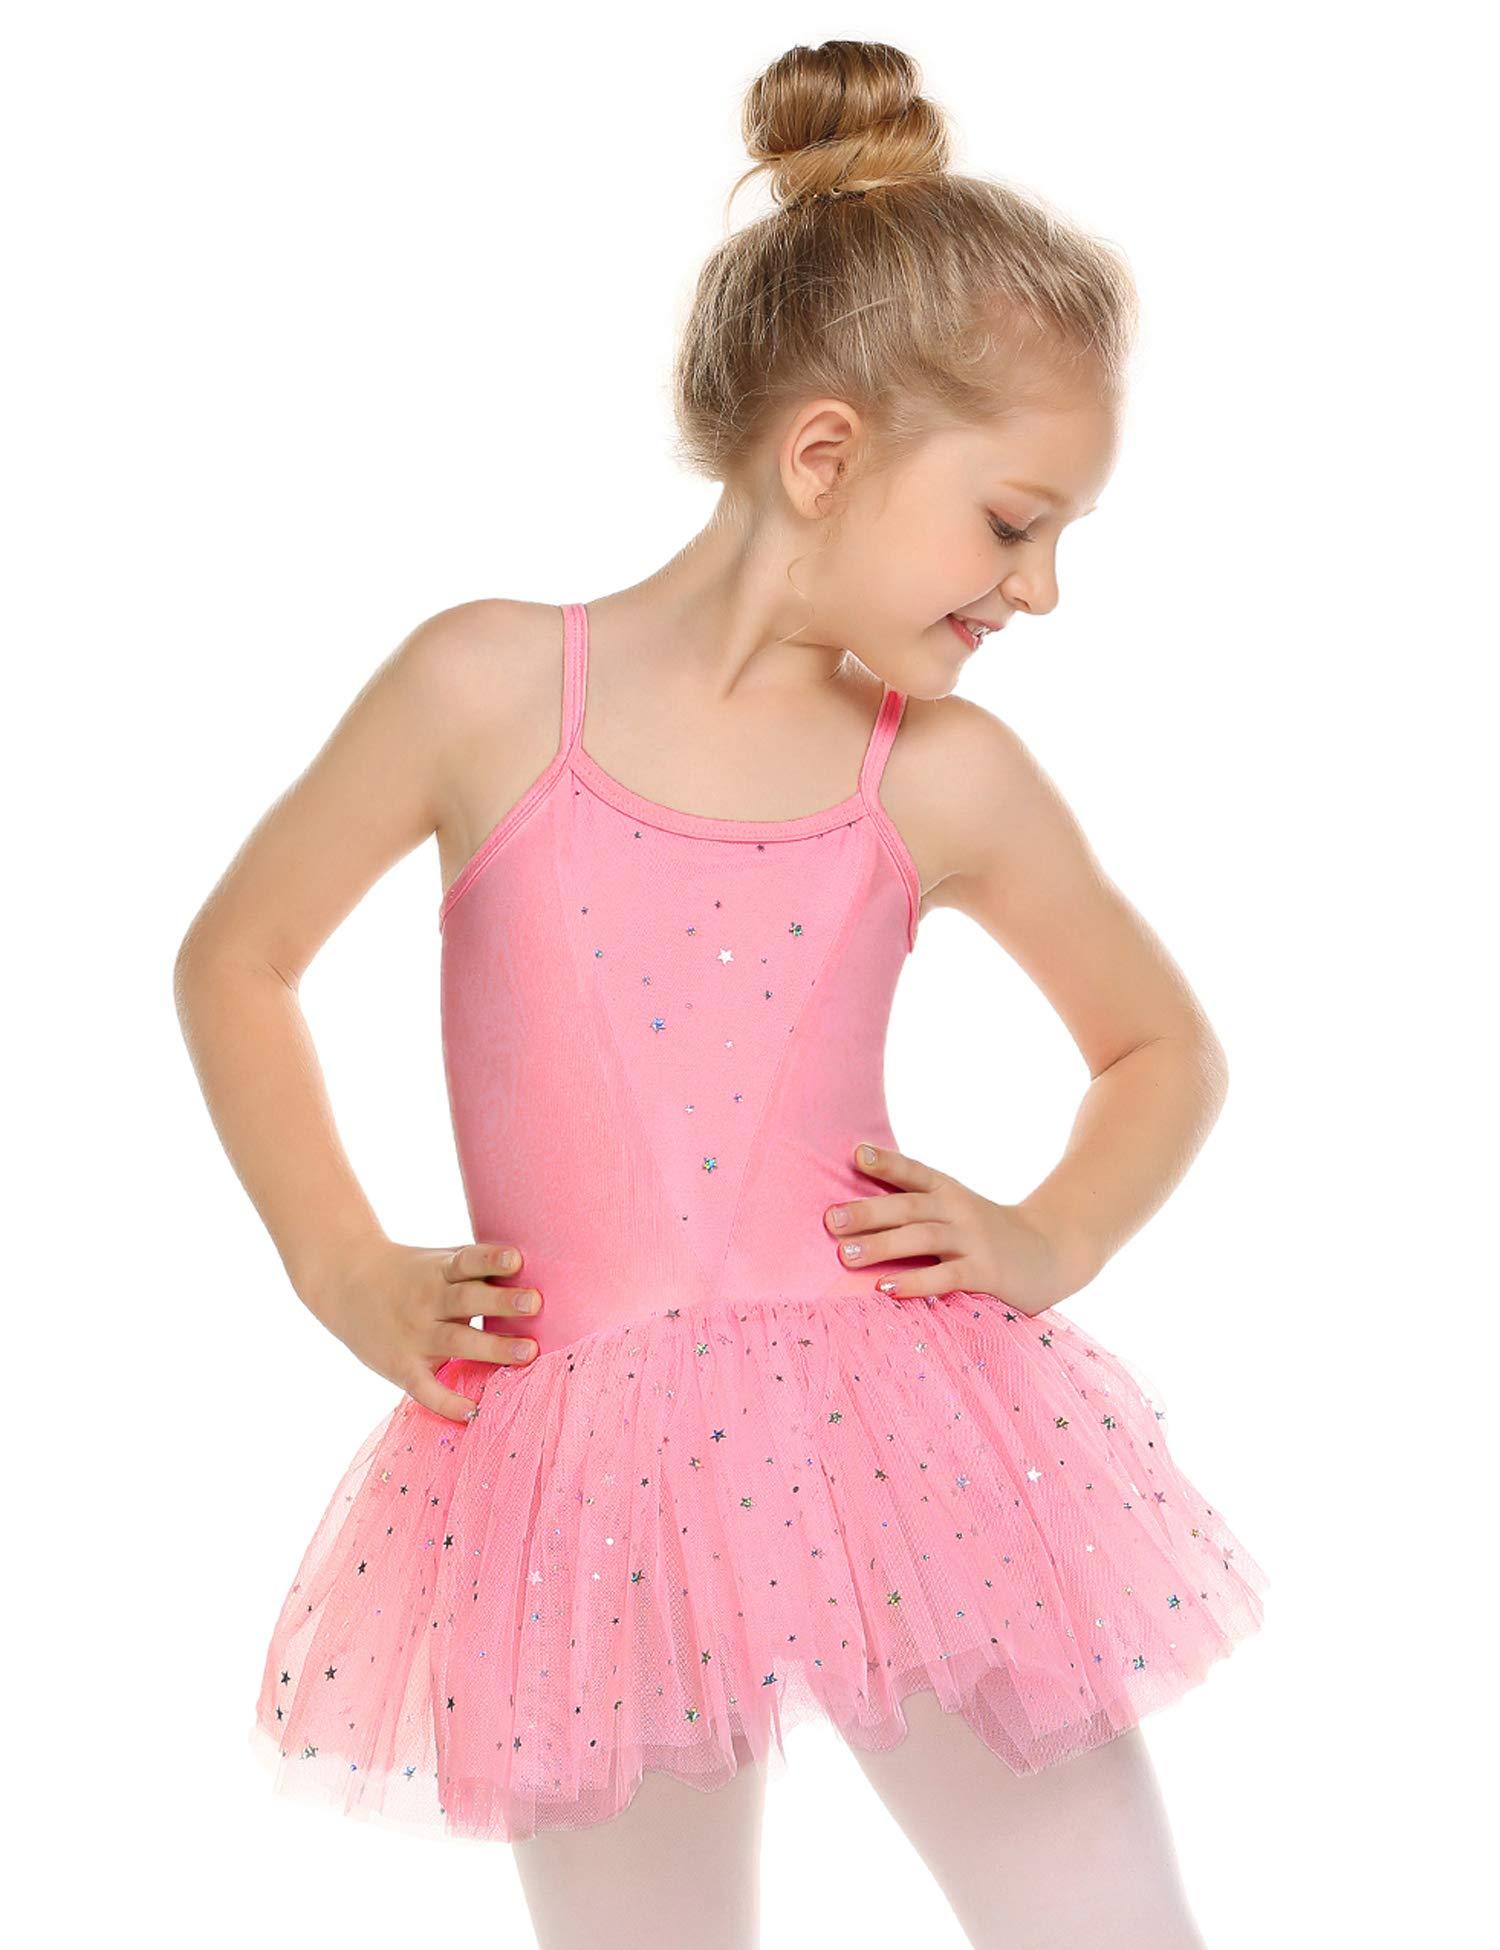 Zaclotre Kids Little Girls Sequin Sparkly Strap Leotards for Dance Ballet Casual Dress